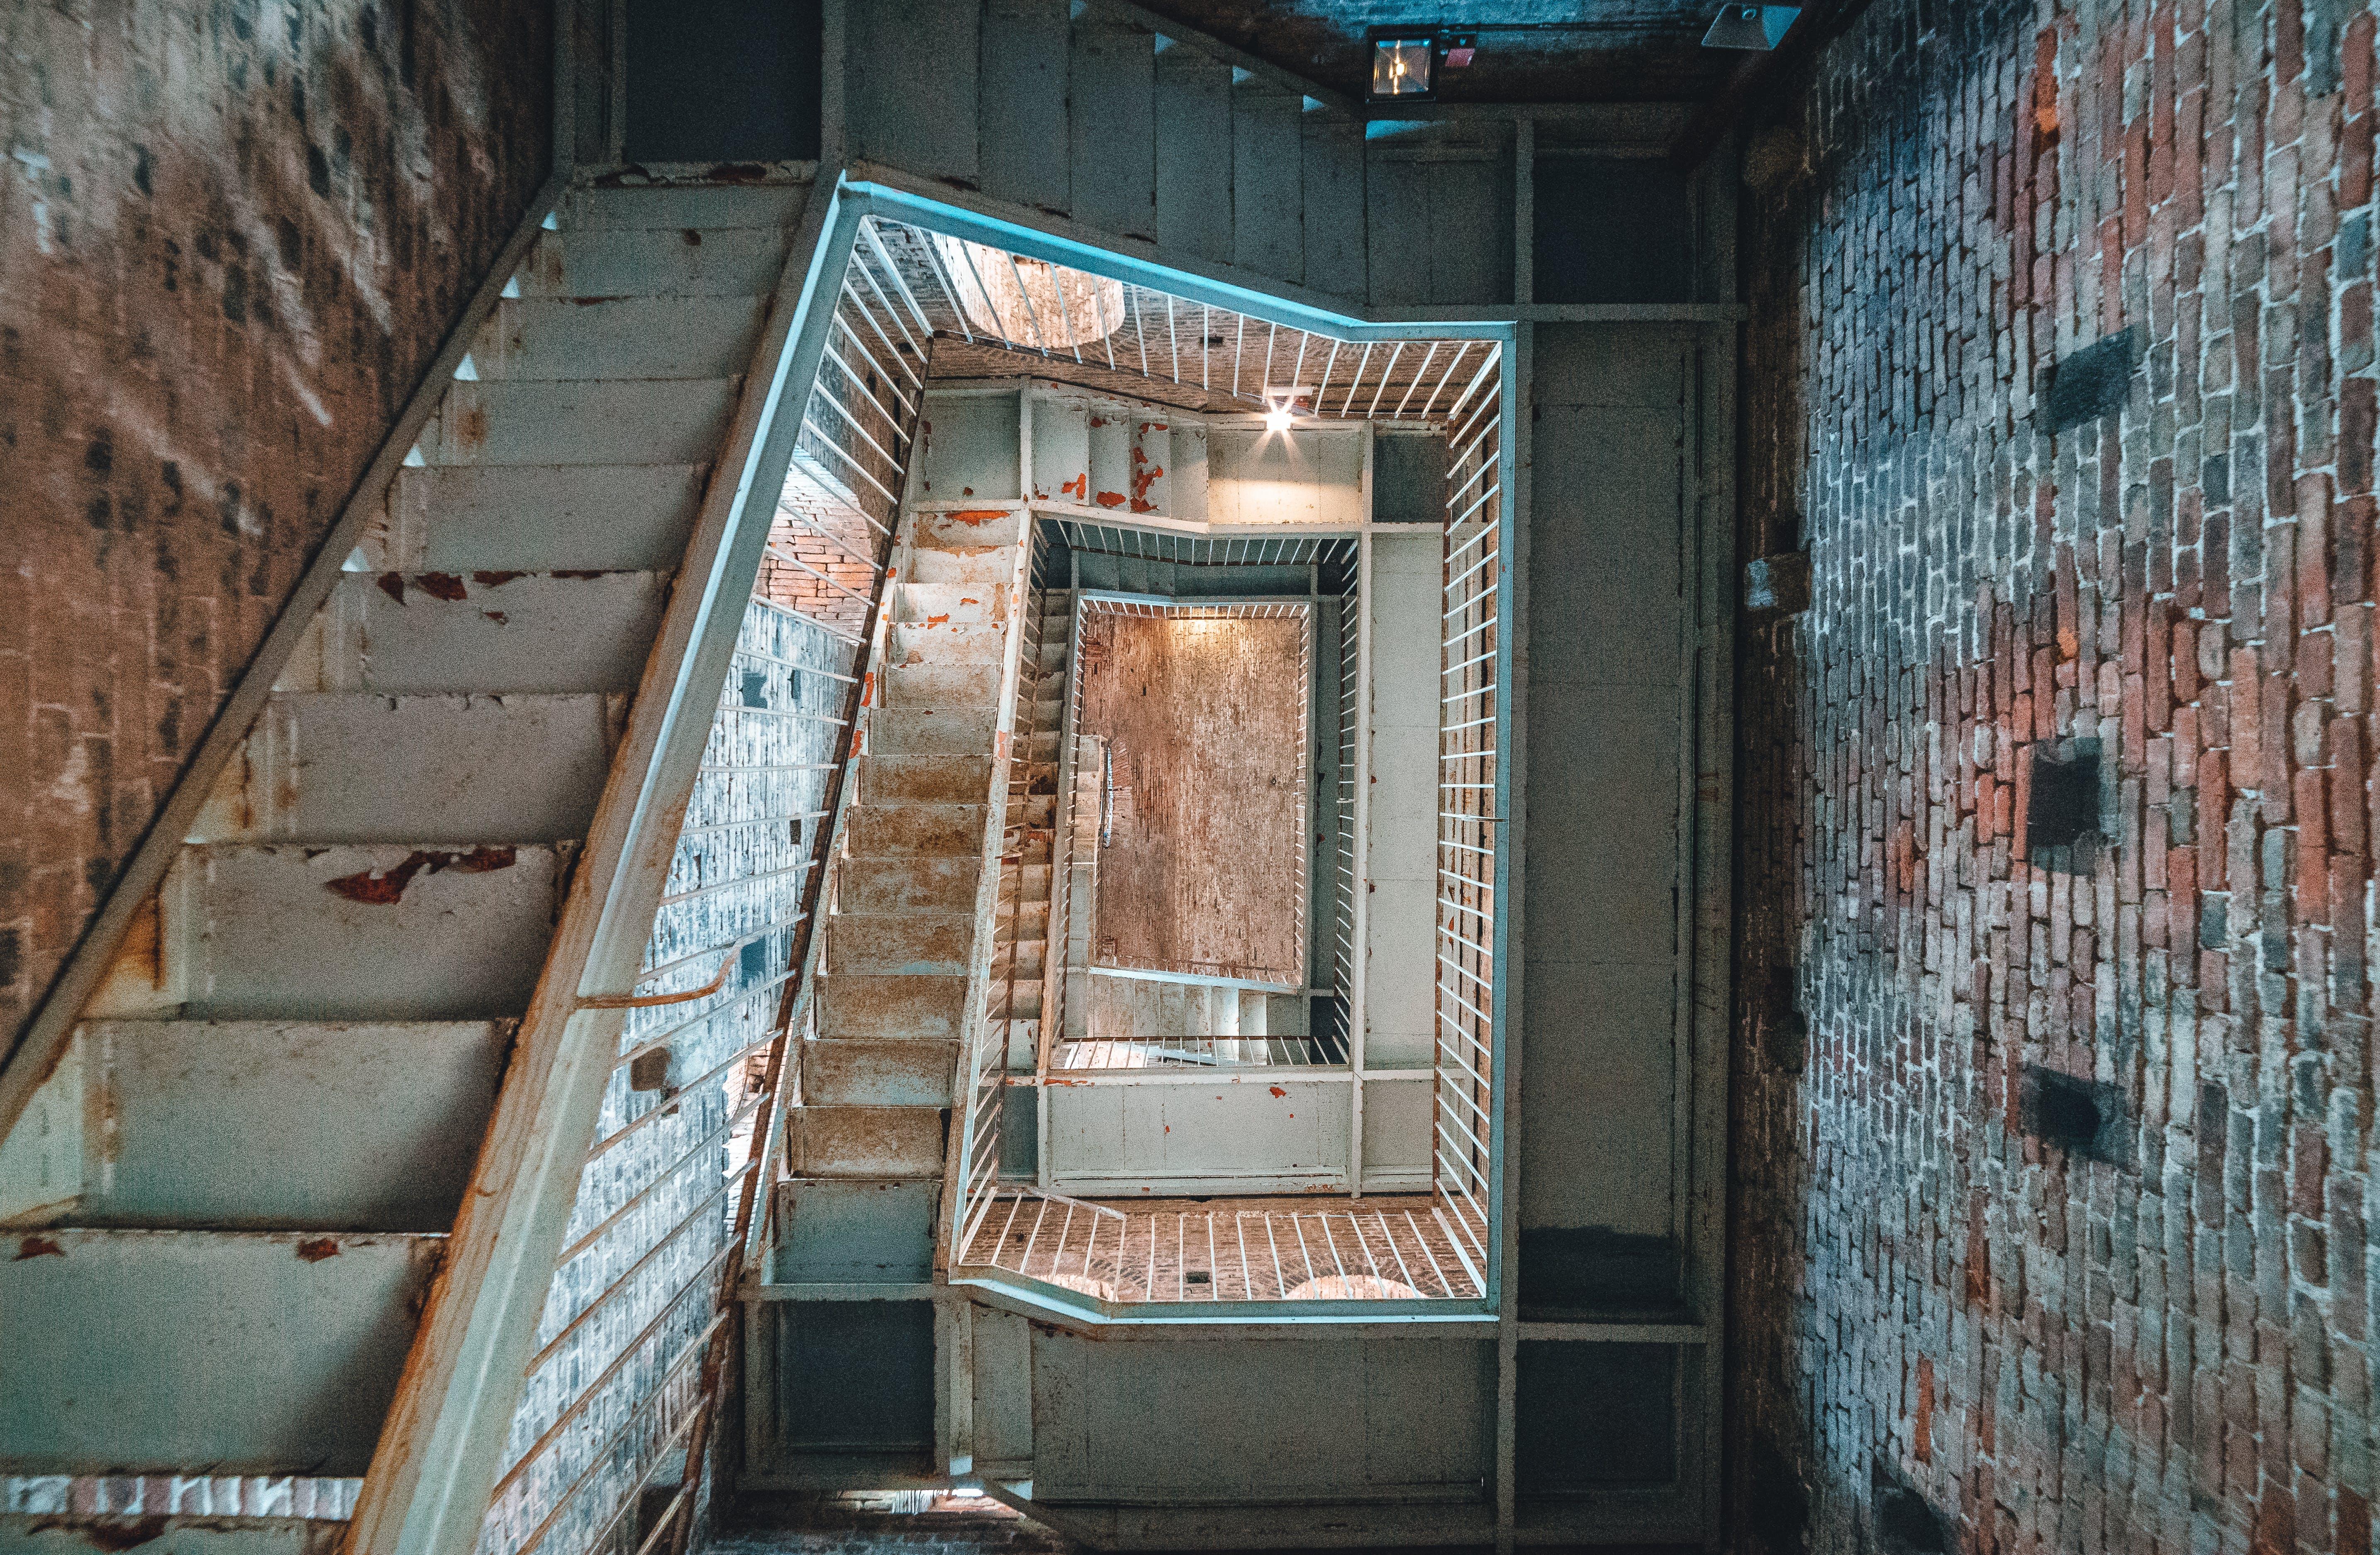 Fotos de stock gratuitas de abandonado, adentro, antiguo, arquitectura